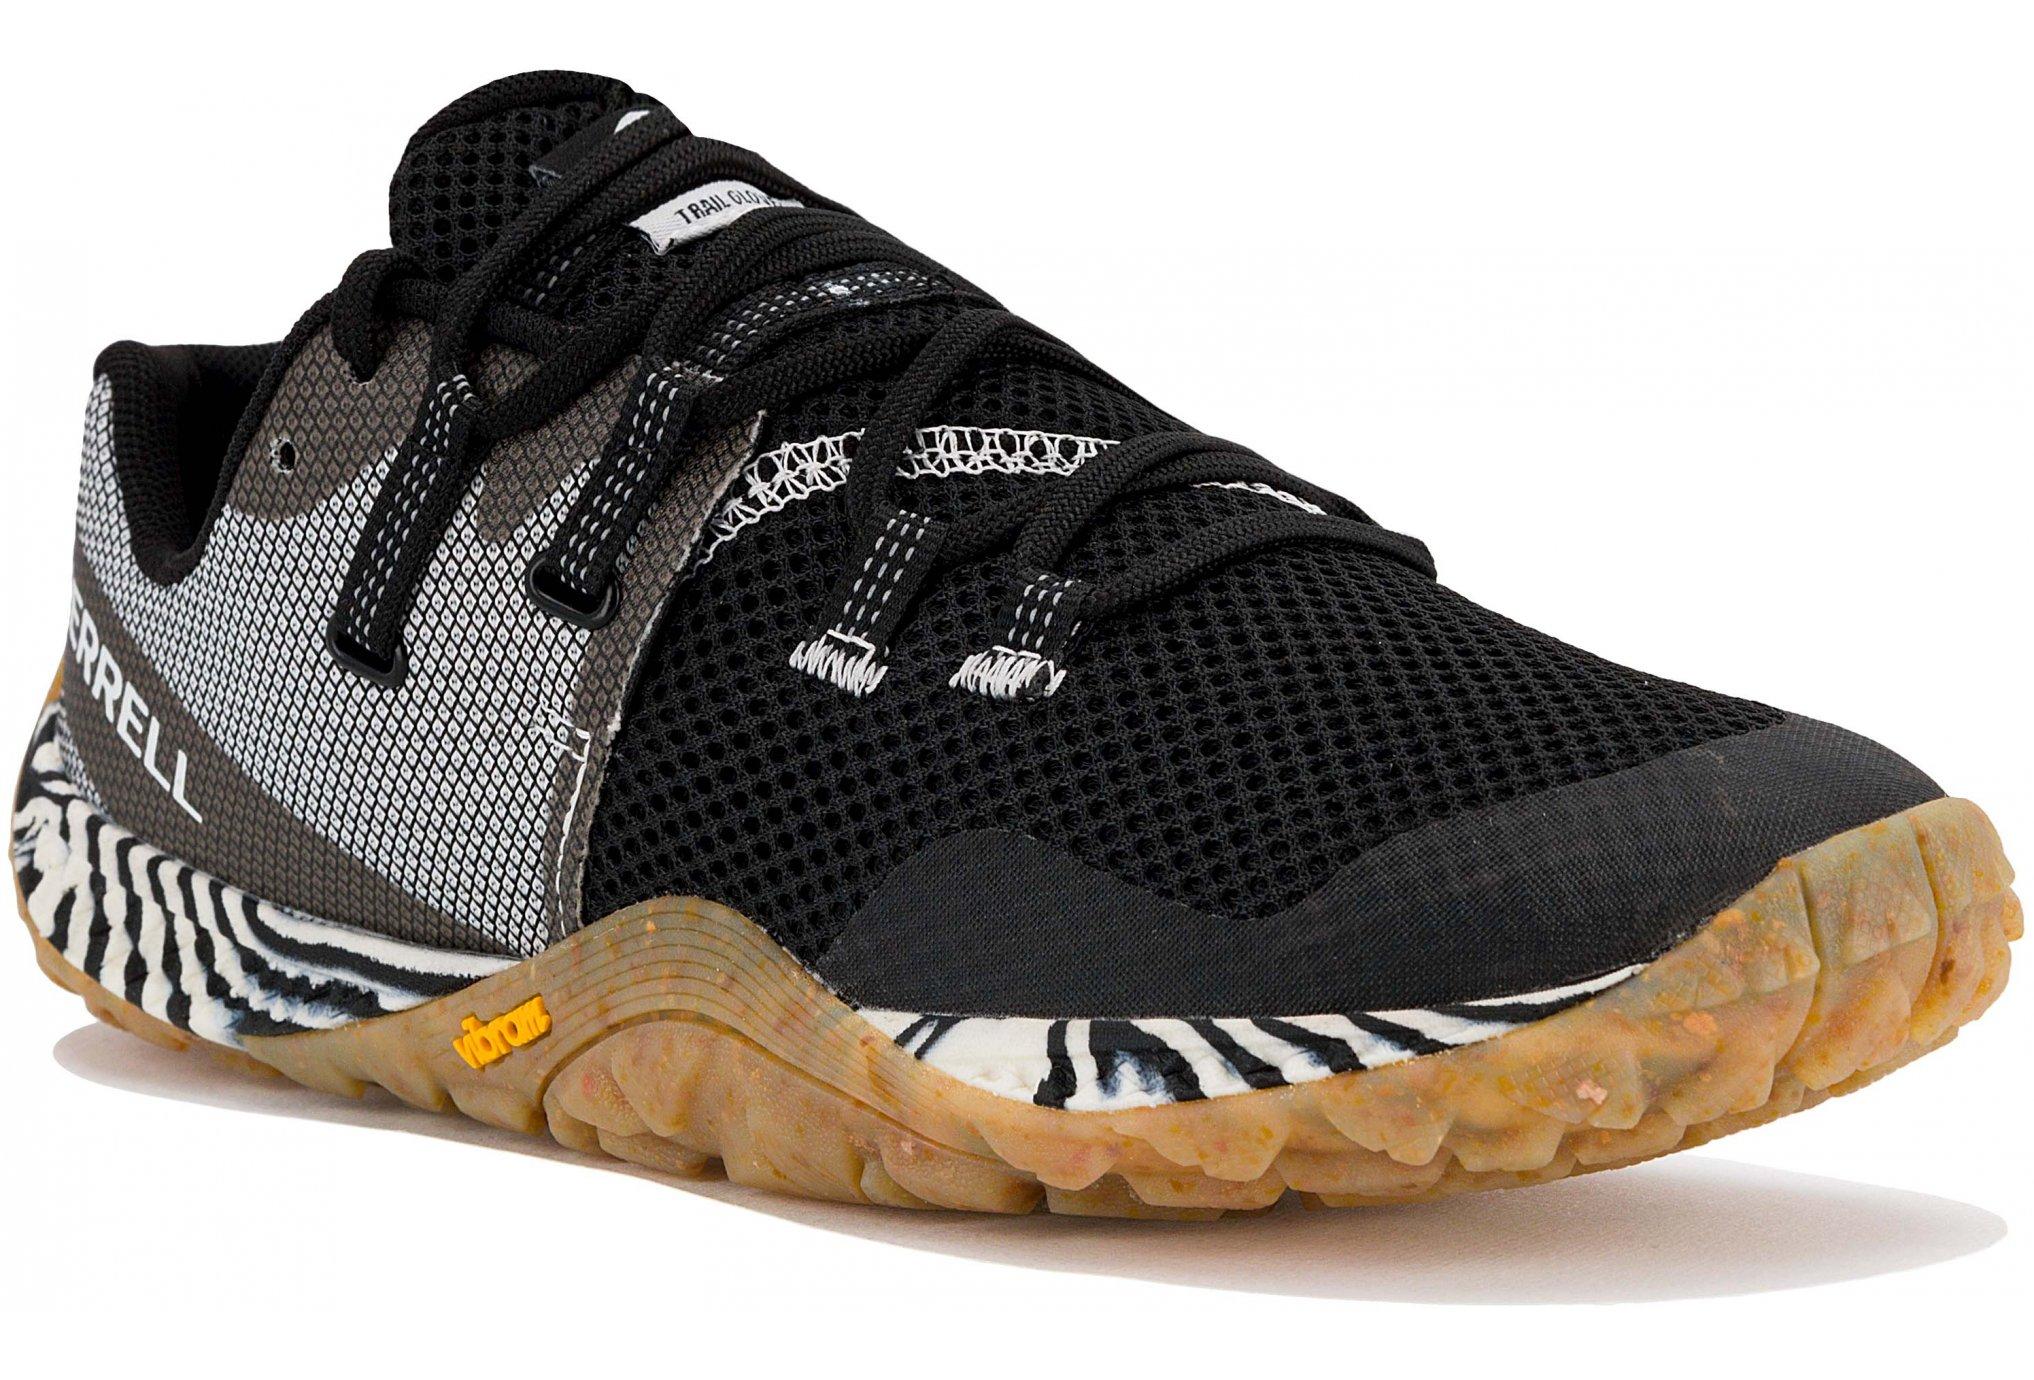 Merrell Trail Glove Solution Dye 6 W Chaussures running femme